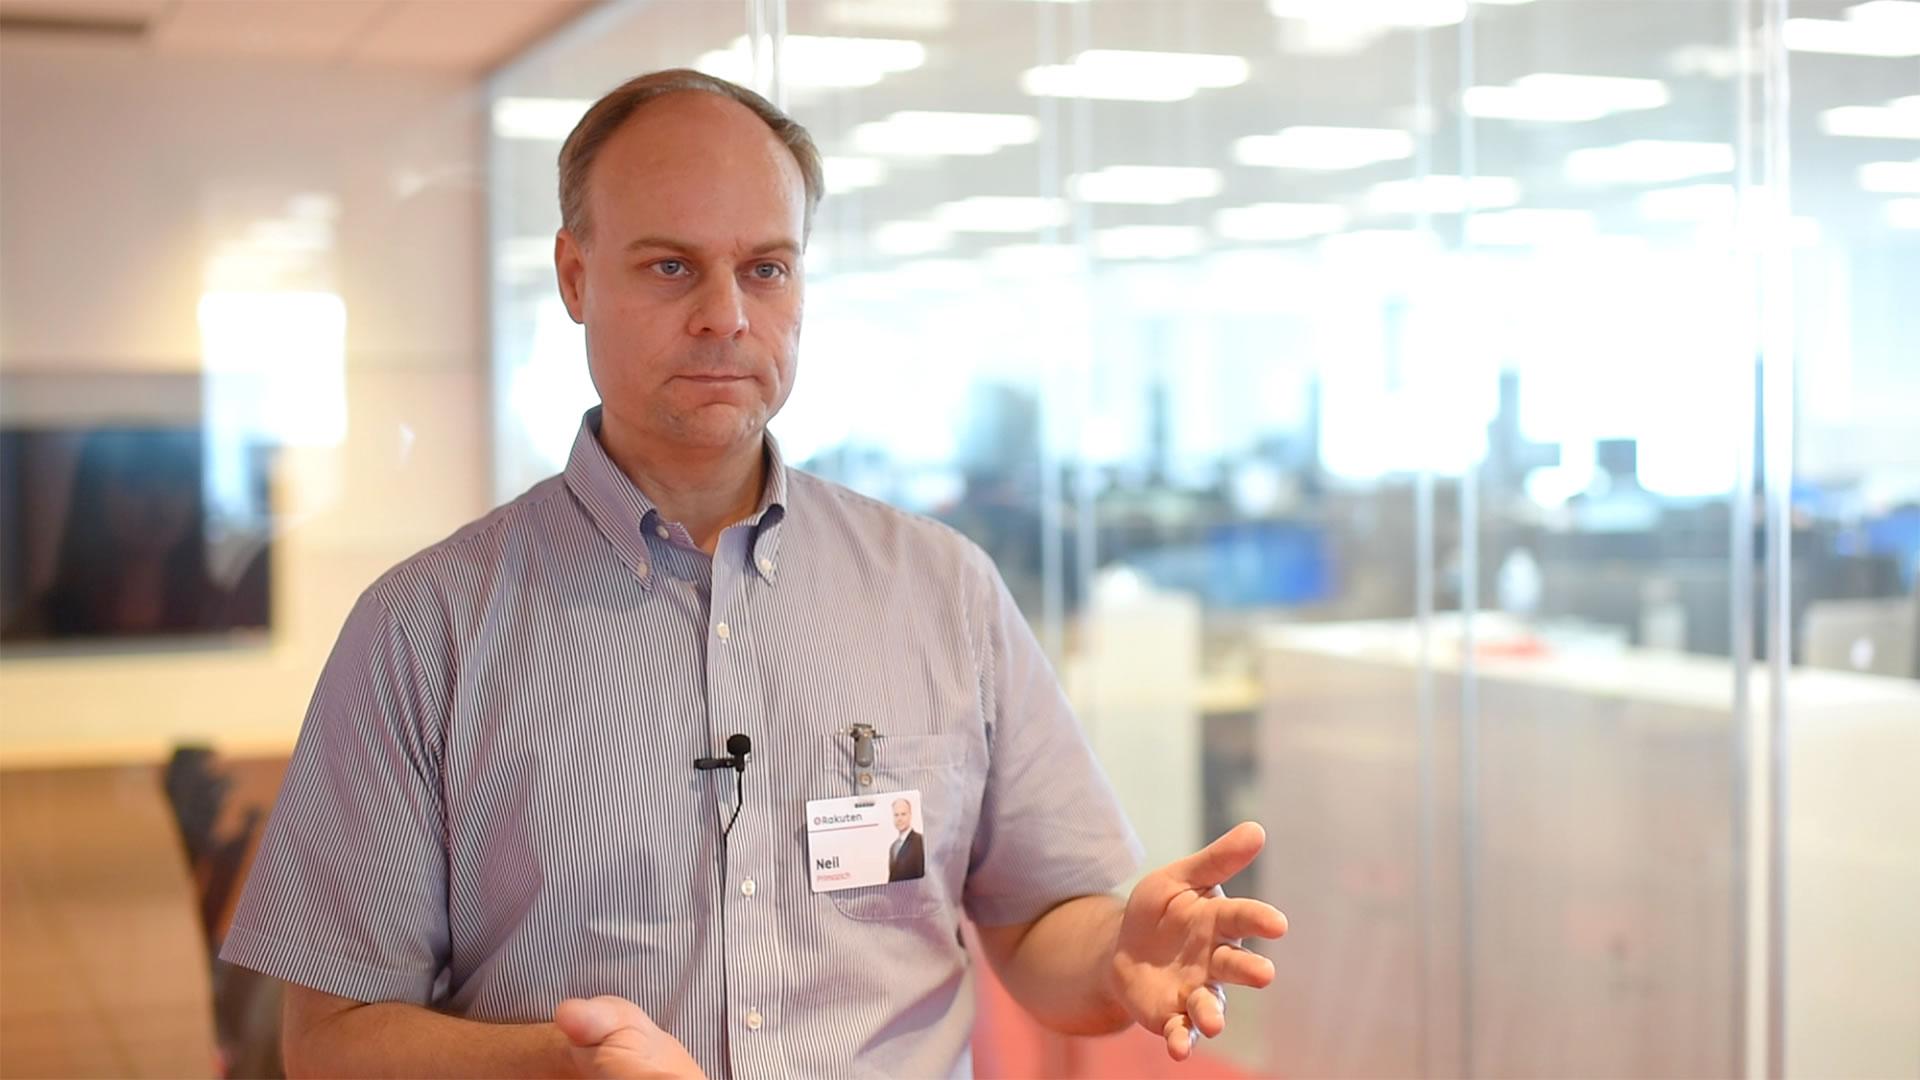 Data Insight Group AIを活用して楽天市場のクーポンPlatformを開発!